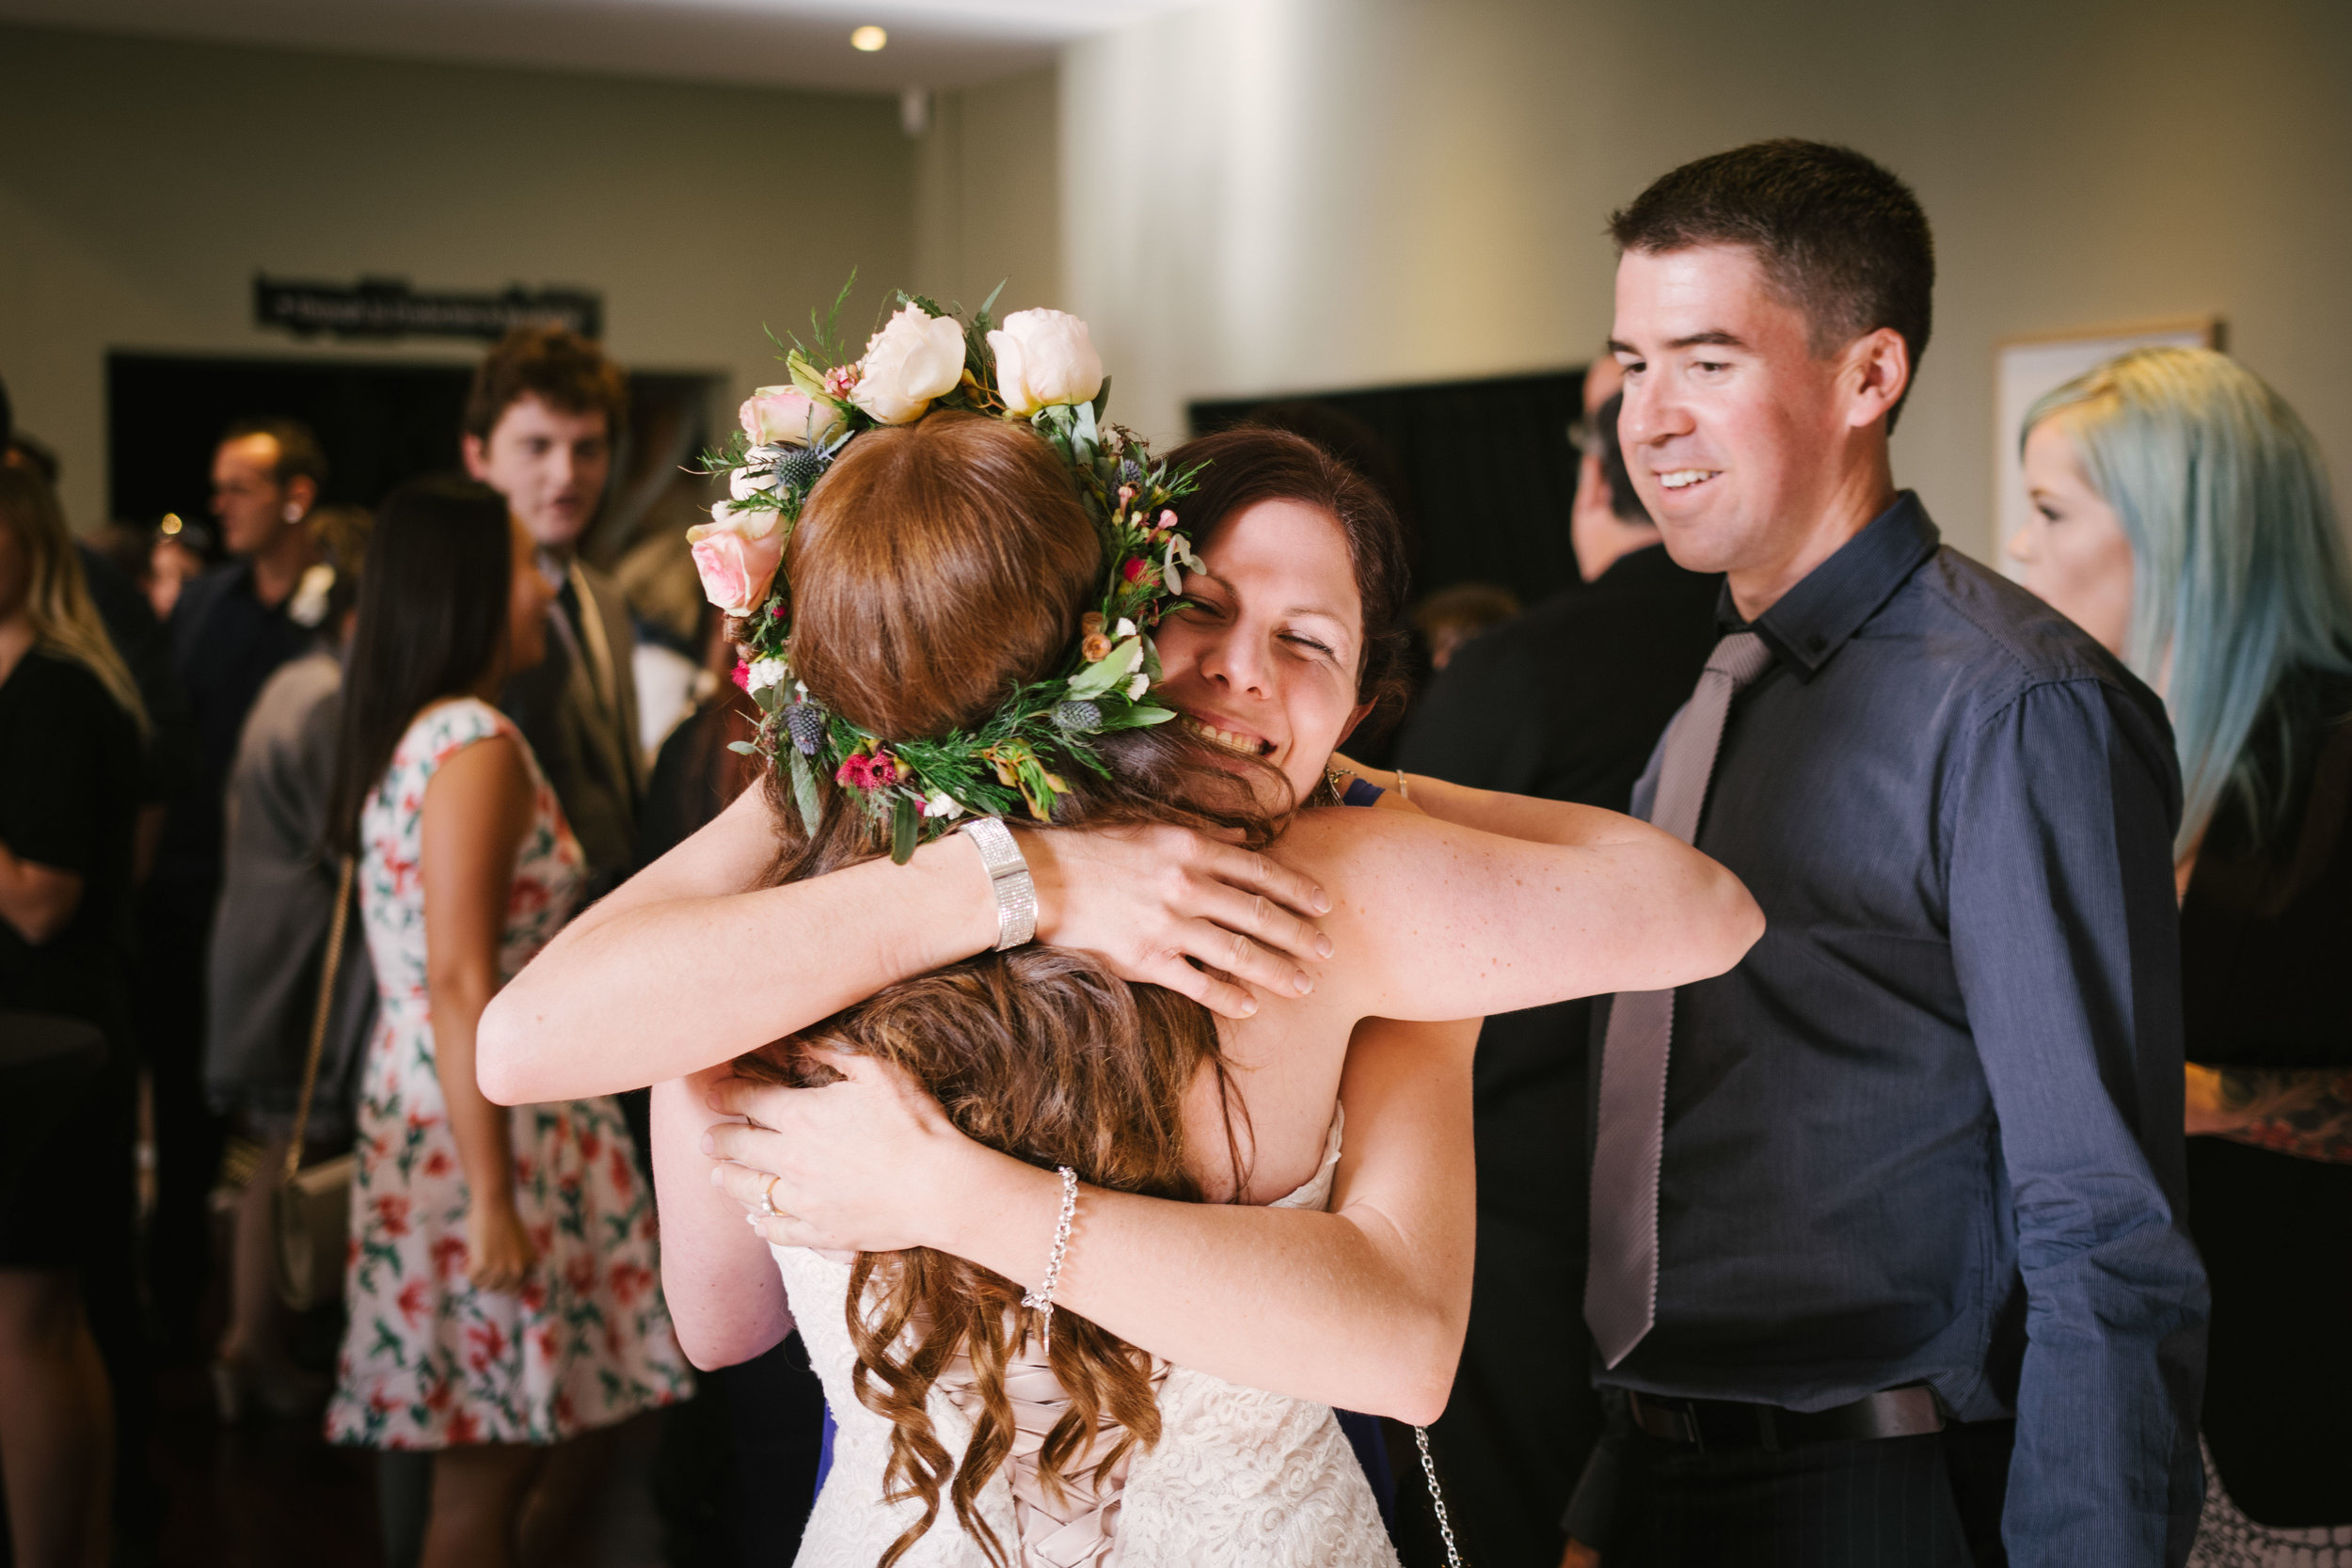 WA Ballet Centre Swan Valley Oakover Grounds Perth Wheatbelt Avon Valley Wedding Photographer (33).jpg